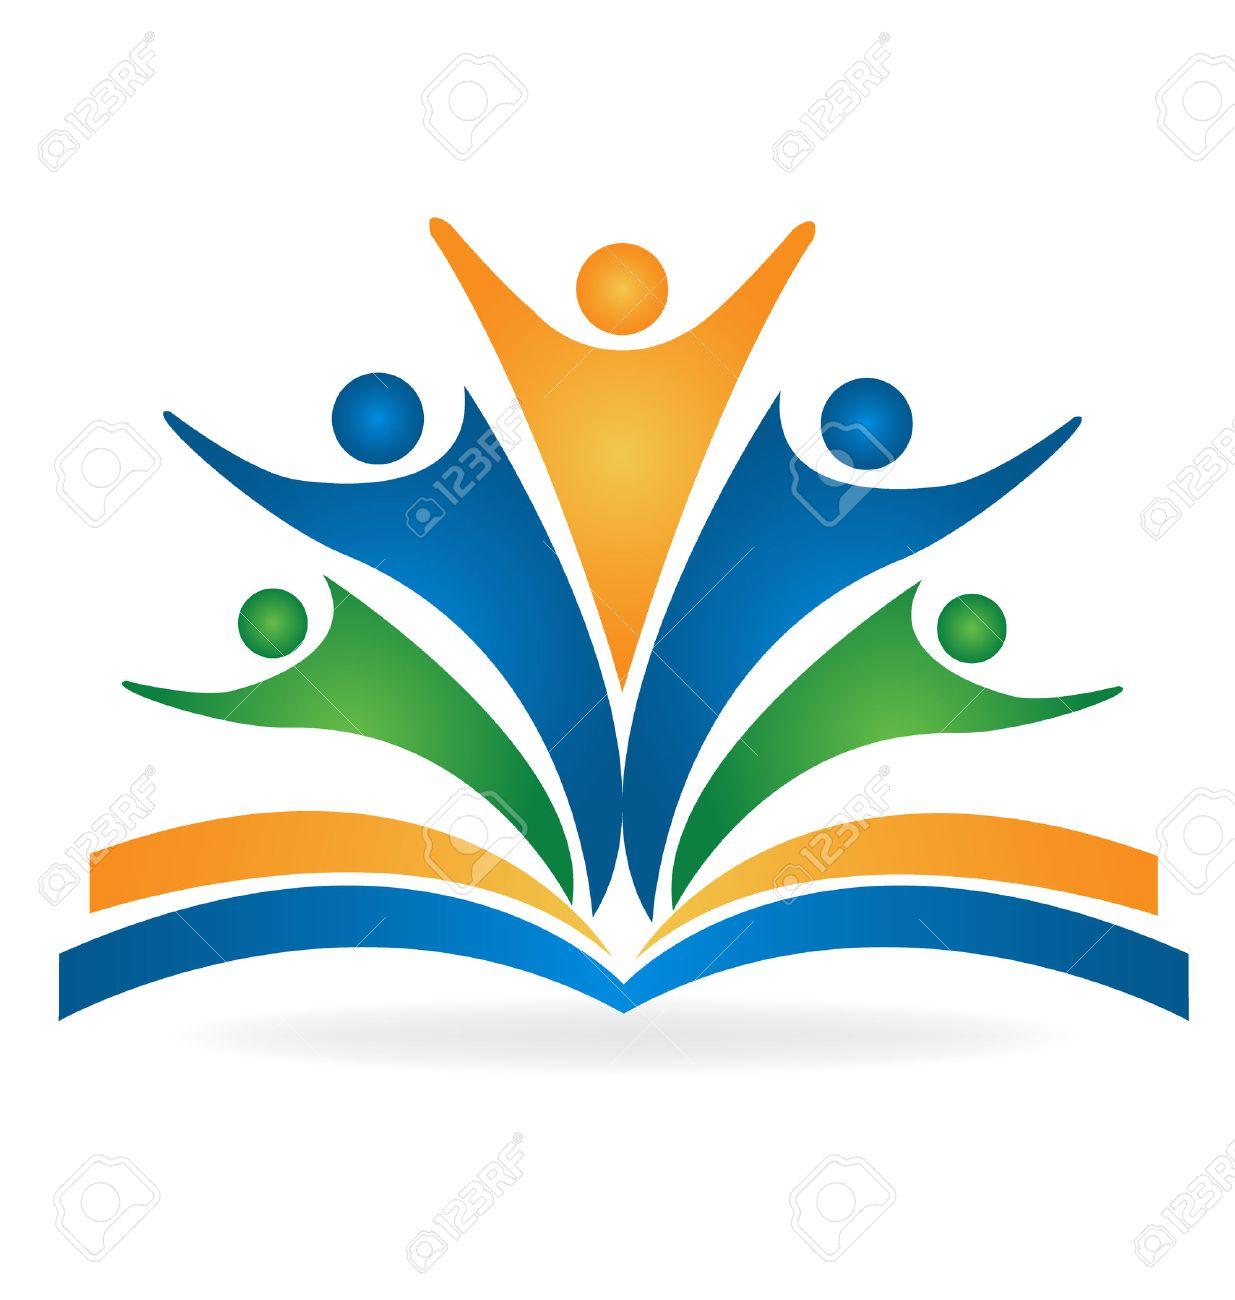 Book teamwork education logo vector image - 53035441